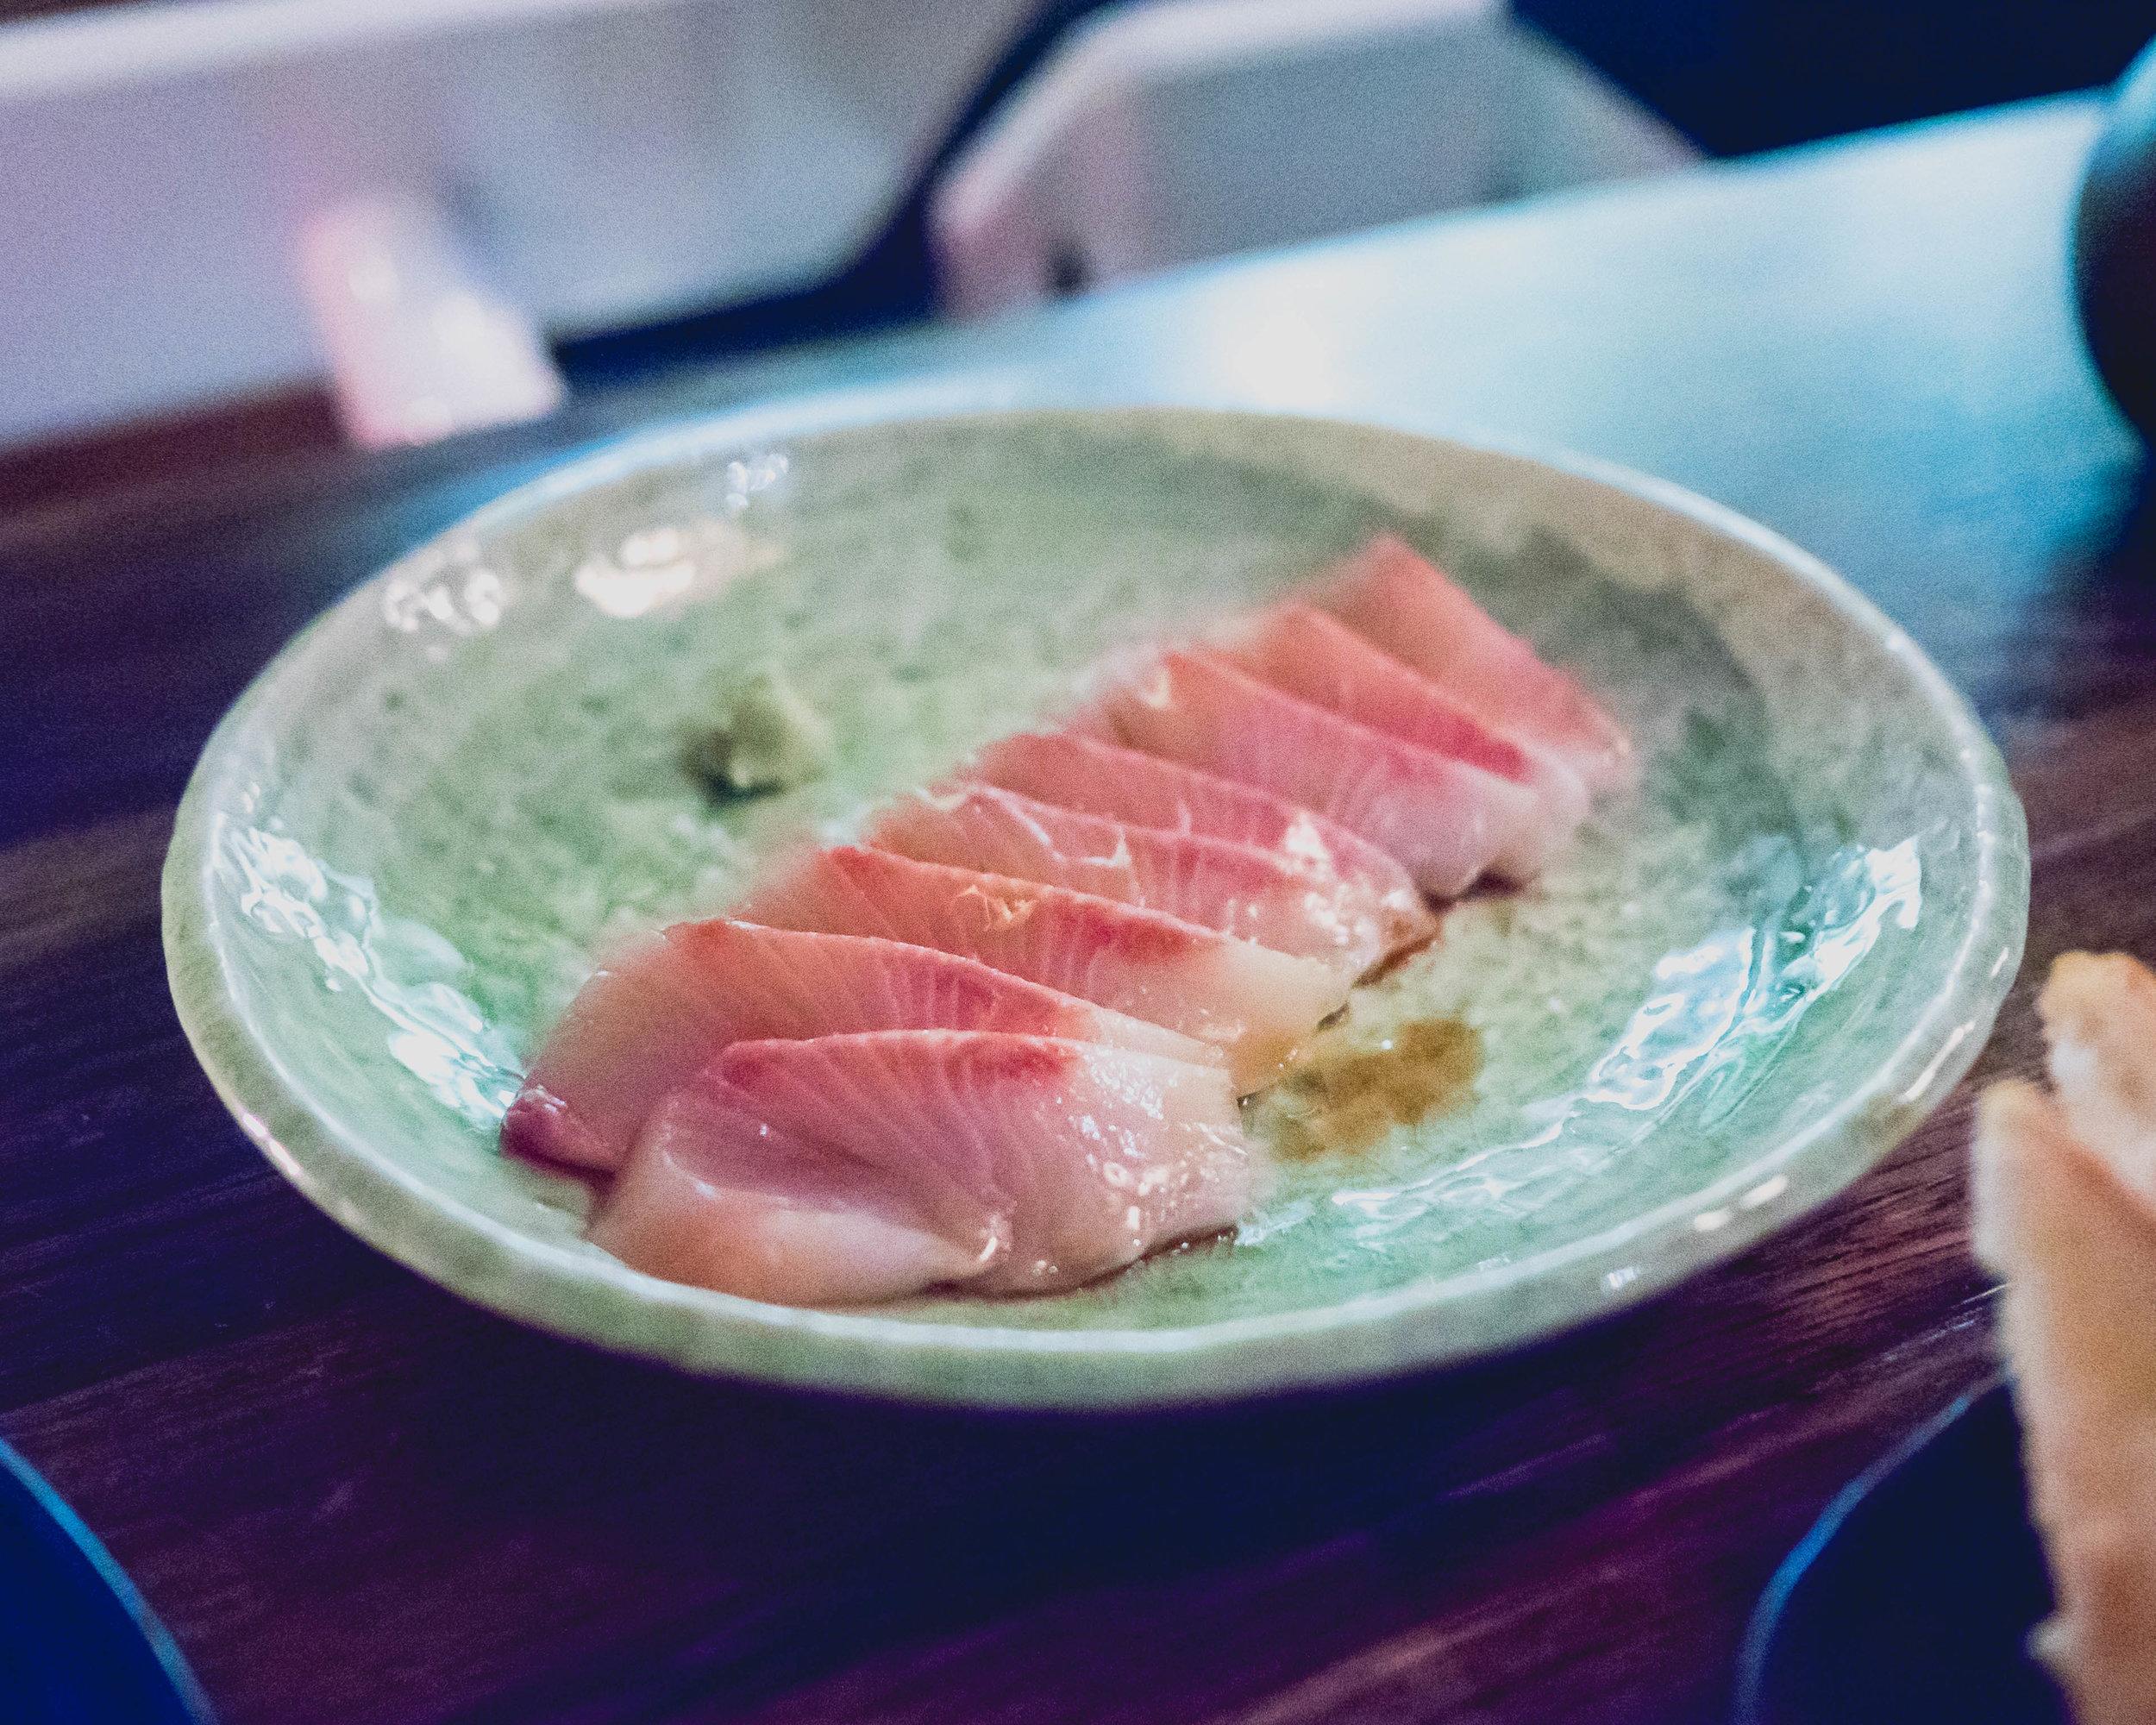 hiramasa sashimi  with aged soy.